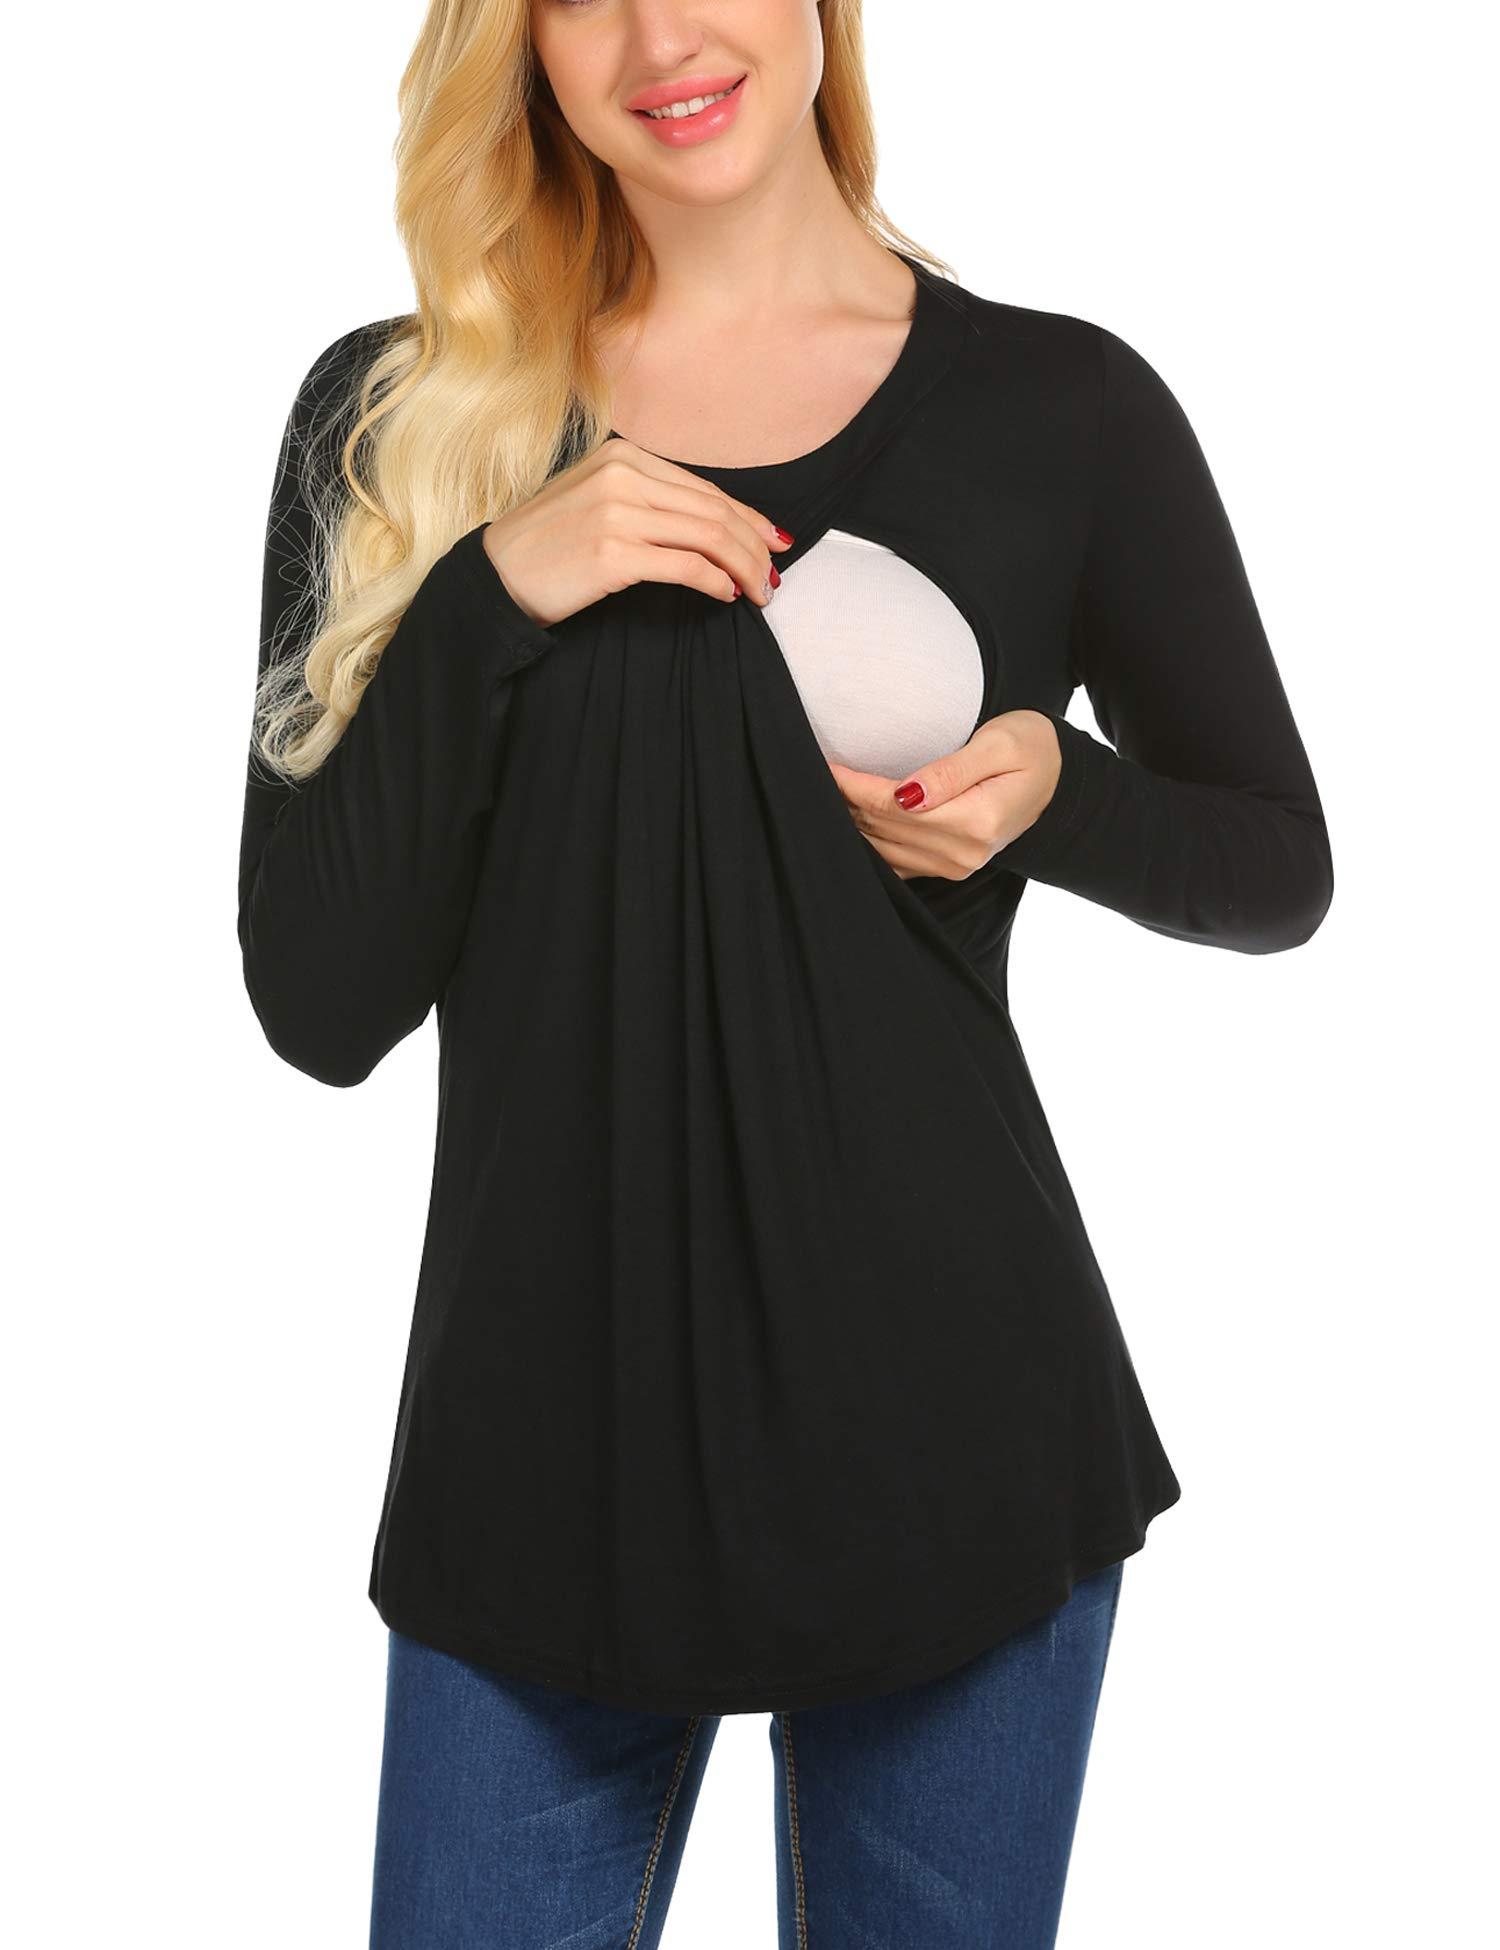 MAXMODA Women's Maternity Nursing Top Breastfeeding Top Tee Shirt Double Layer Short Sleeve Pregnancy Shirt